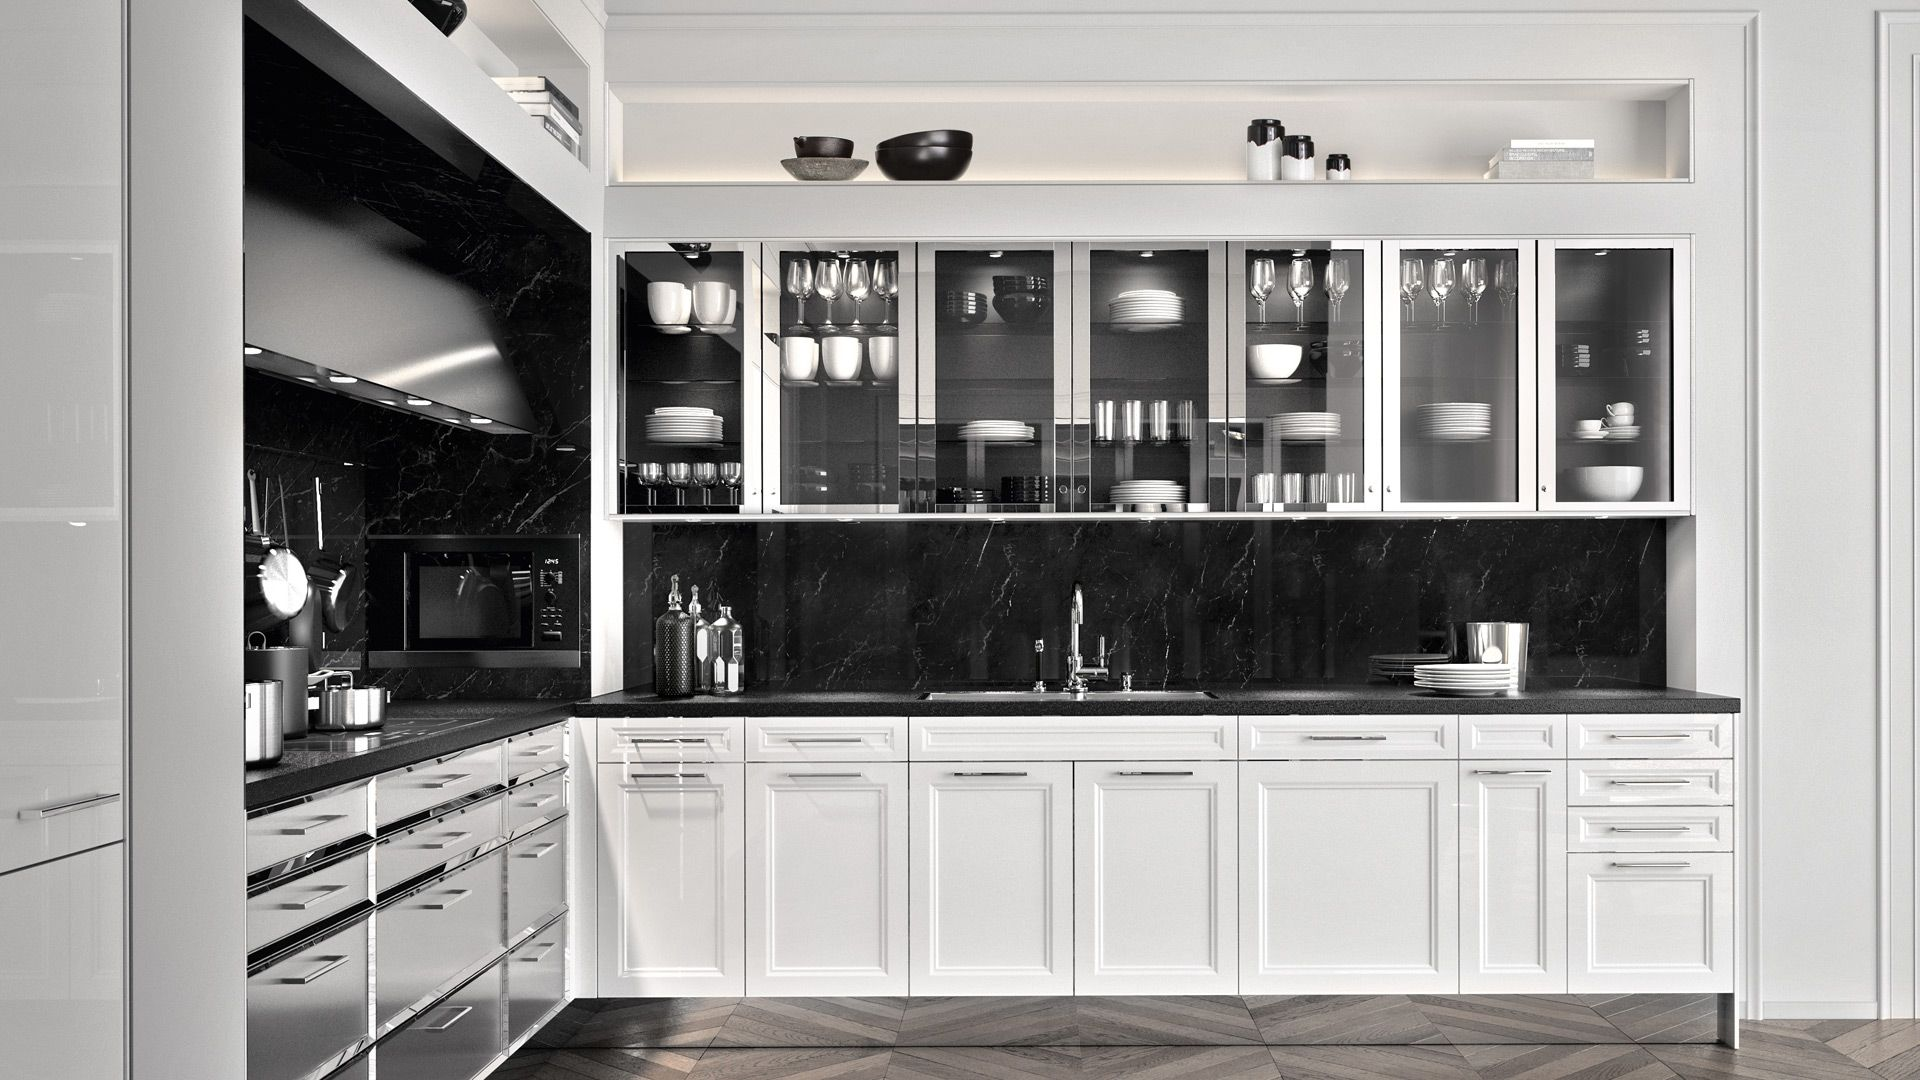 siematic kitchen beaux arts - Google Search | Küche | Pinterest ...